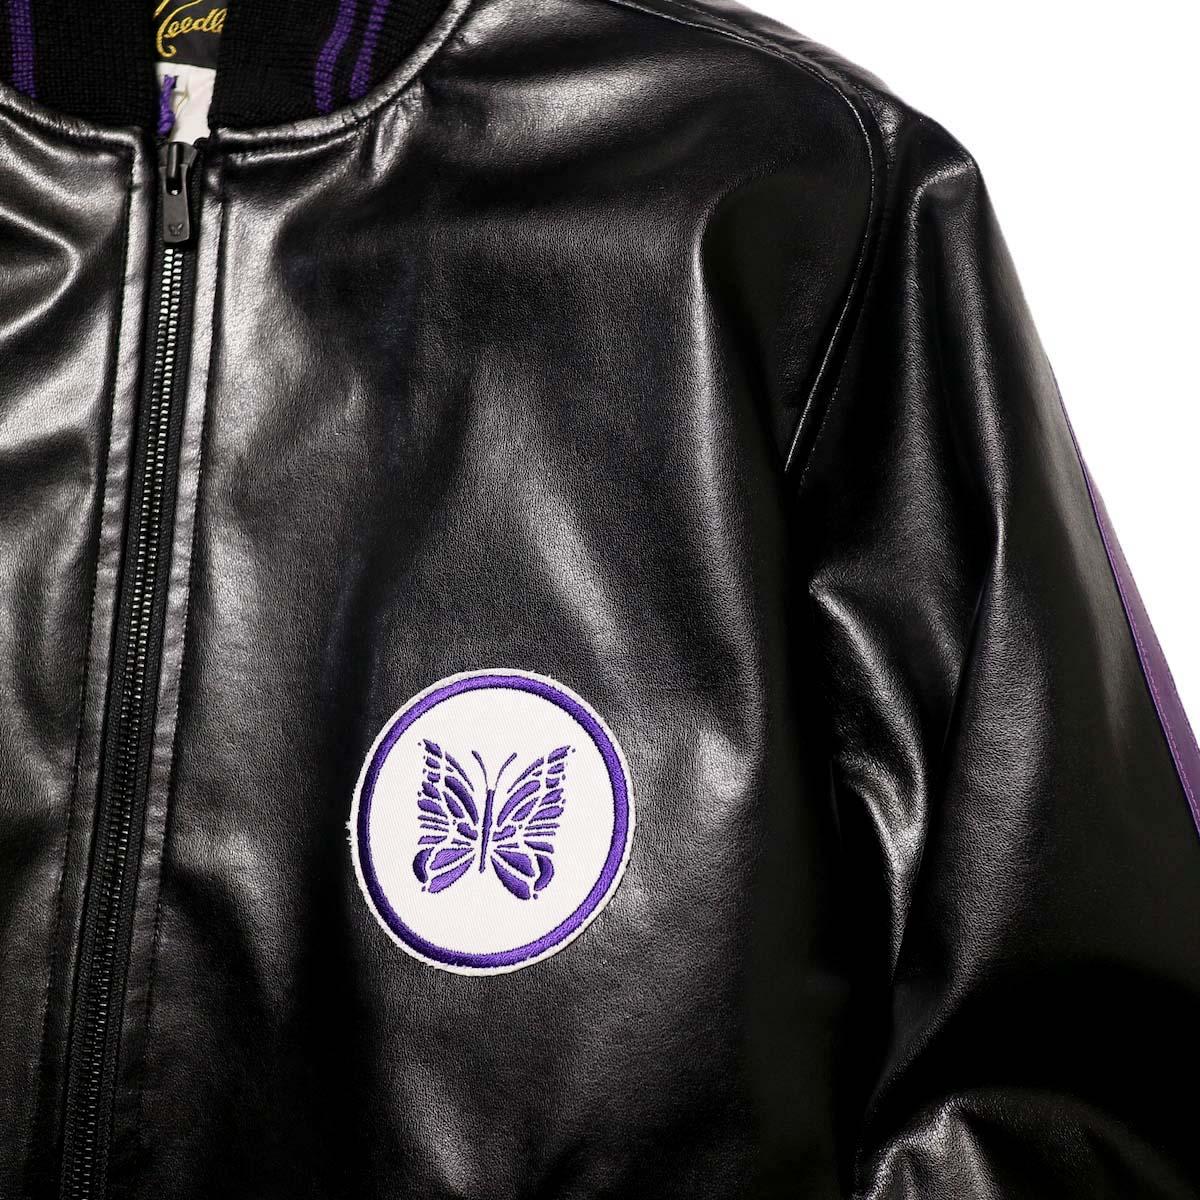 Needles / Award Jacket - Faux Lthr (Black)ワッペン